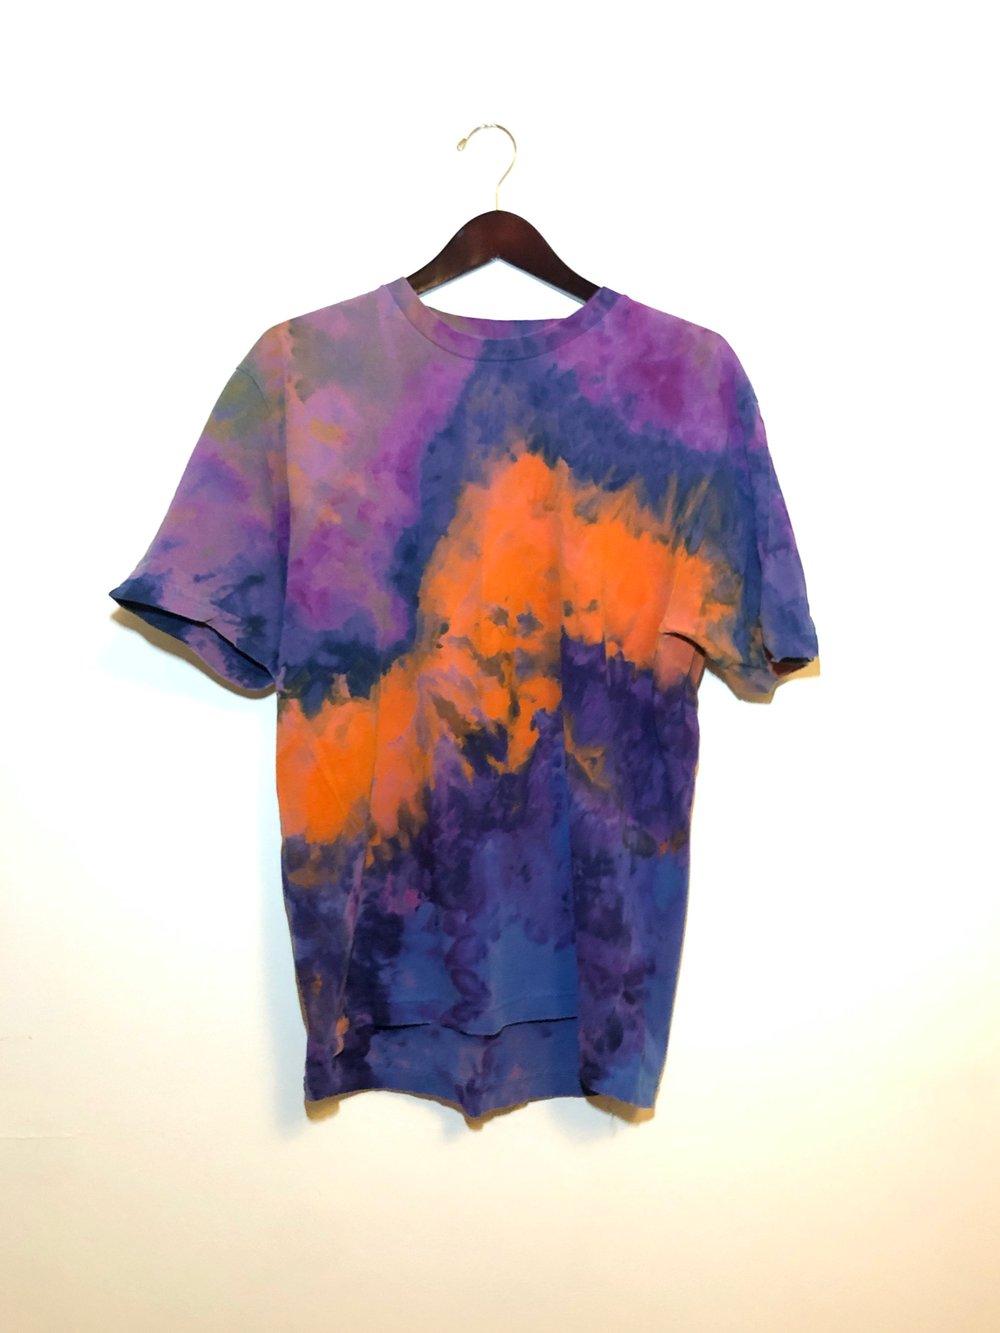 Shirt #21 - Medium